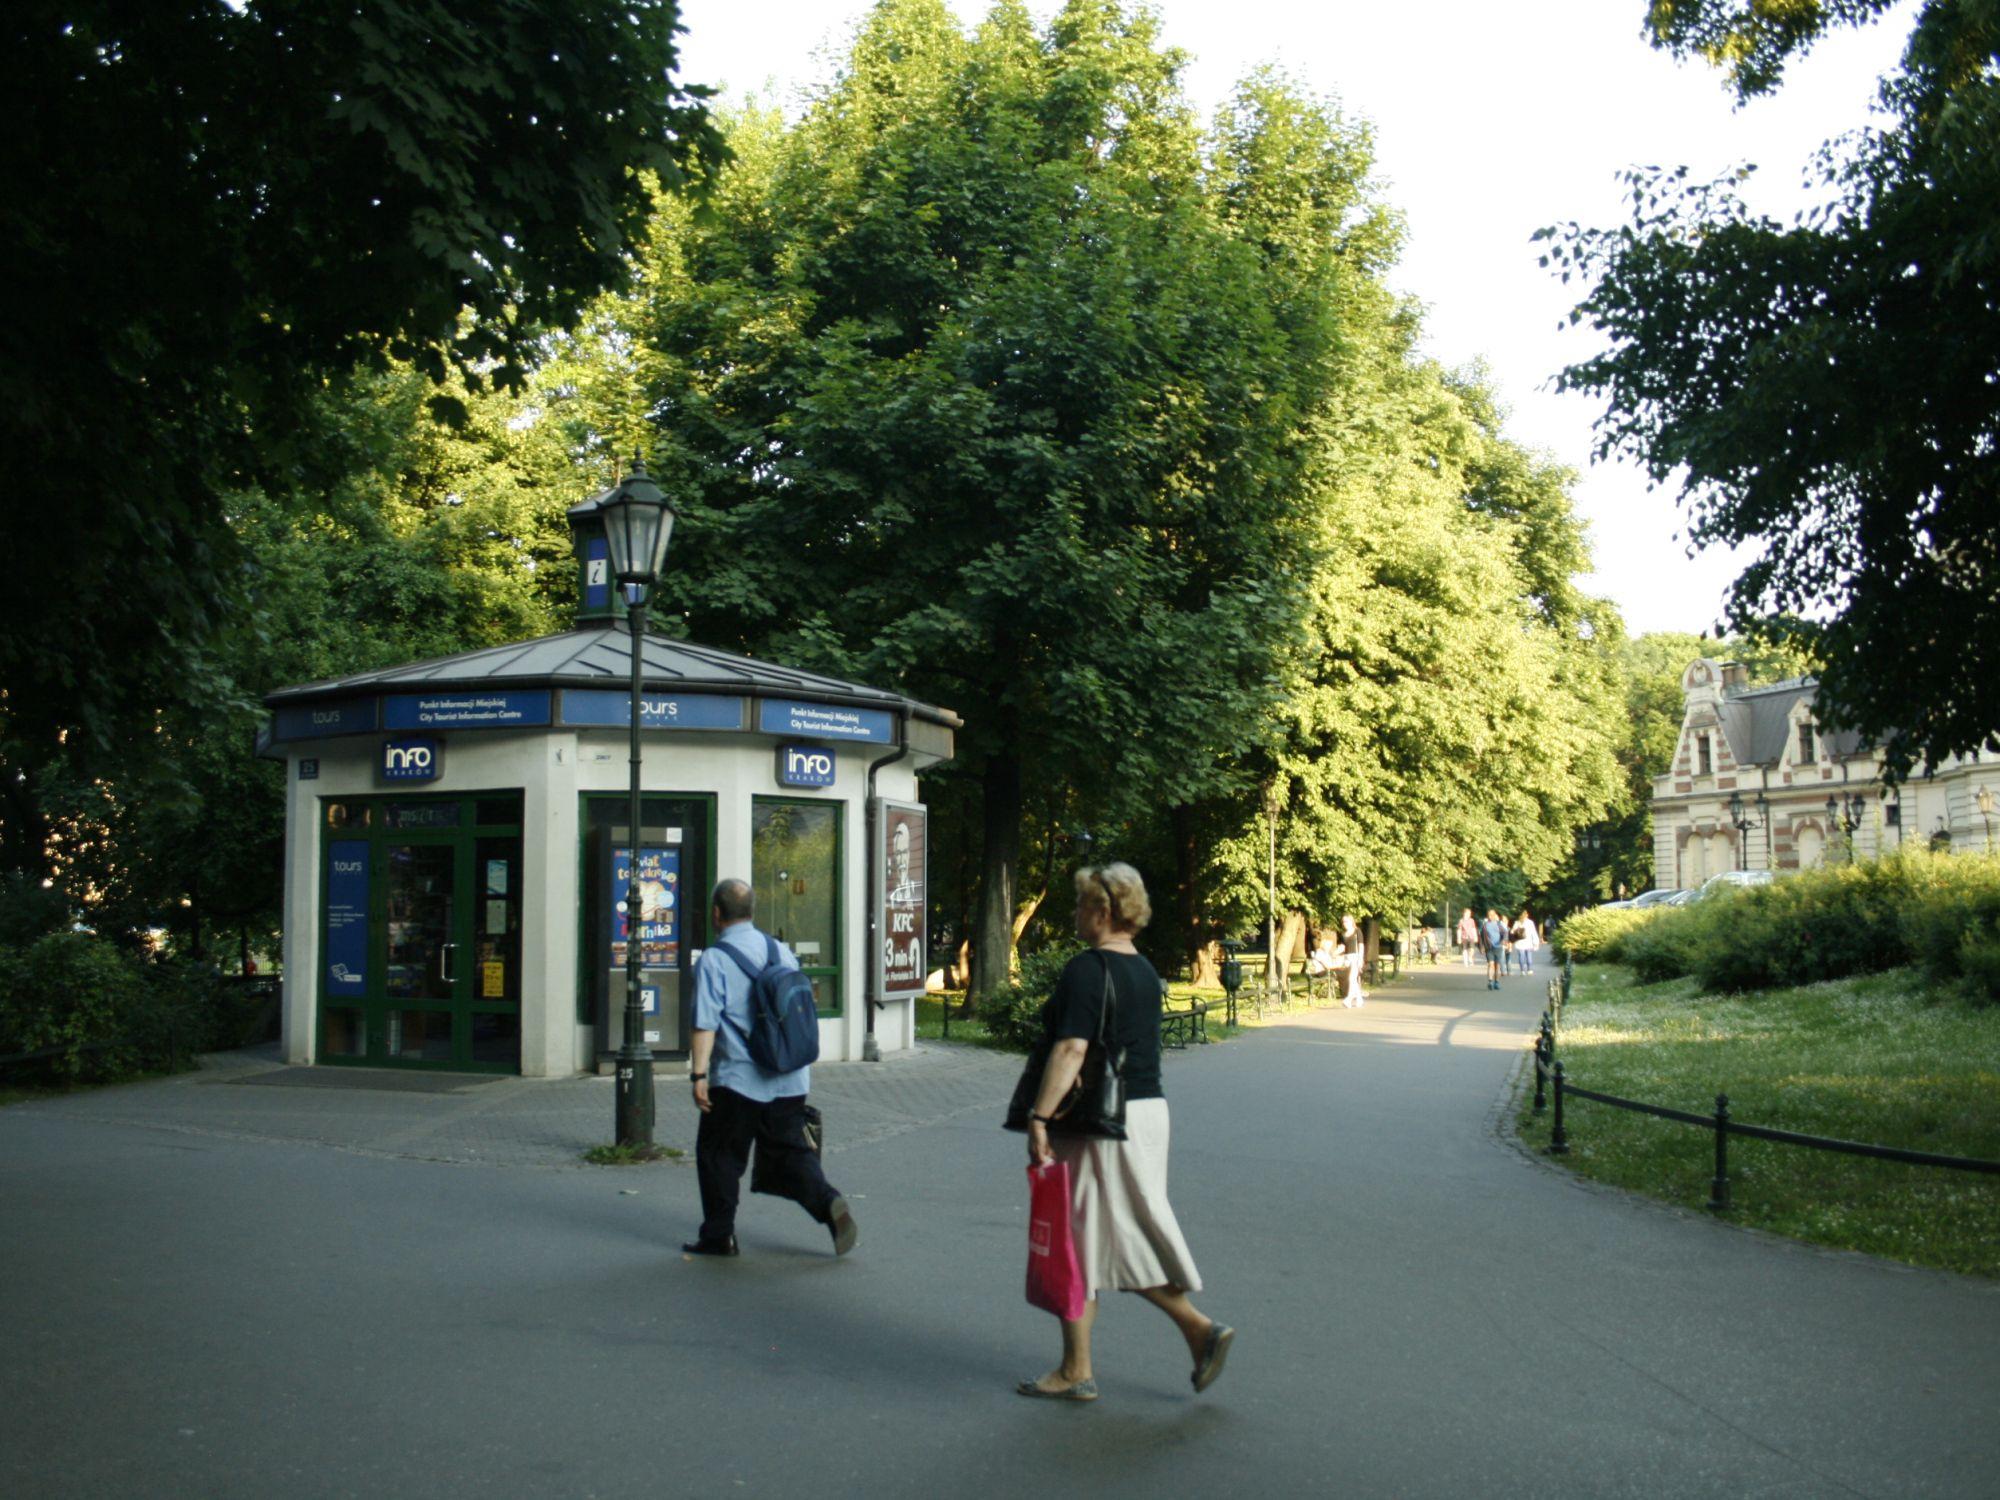 Tourist Information Spots in Krakow, Poland